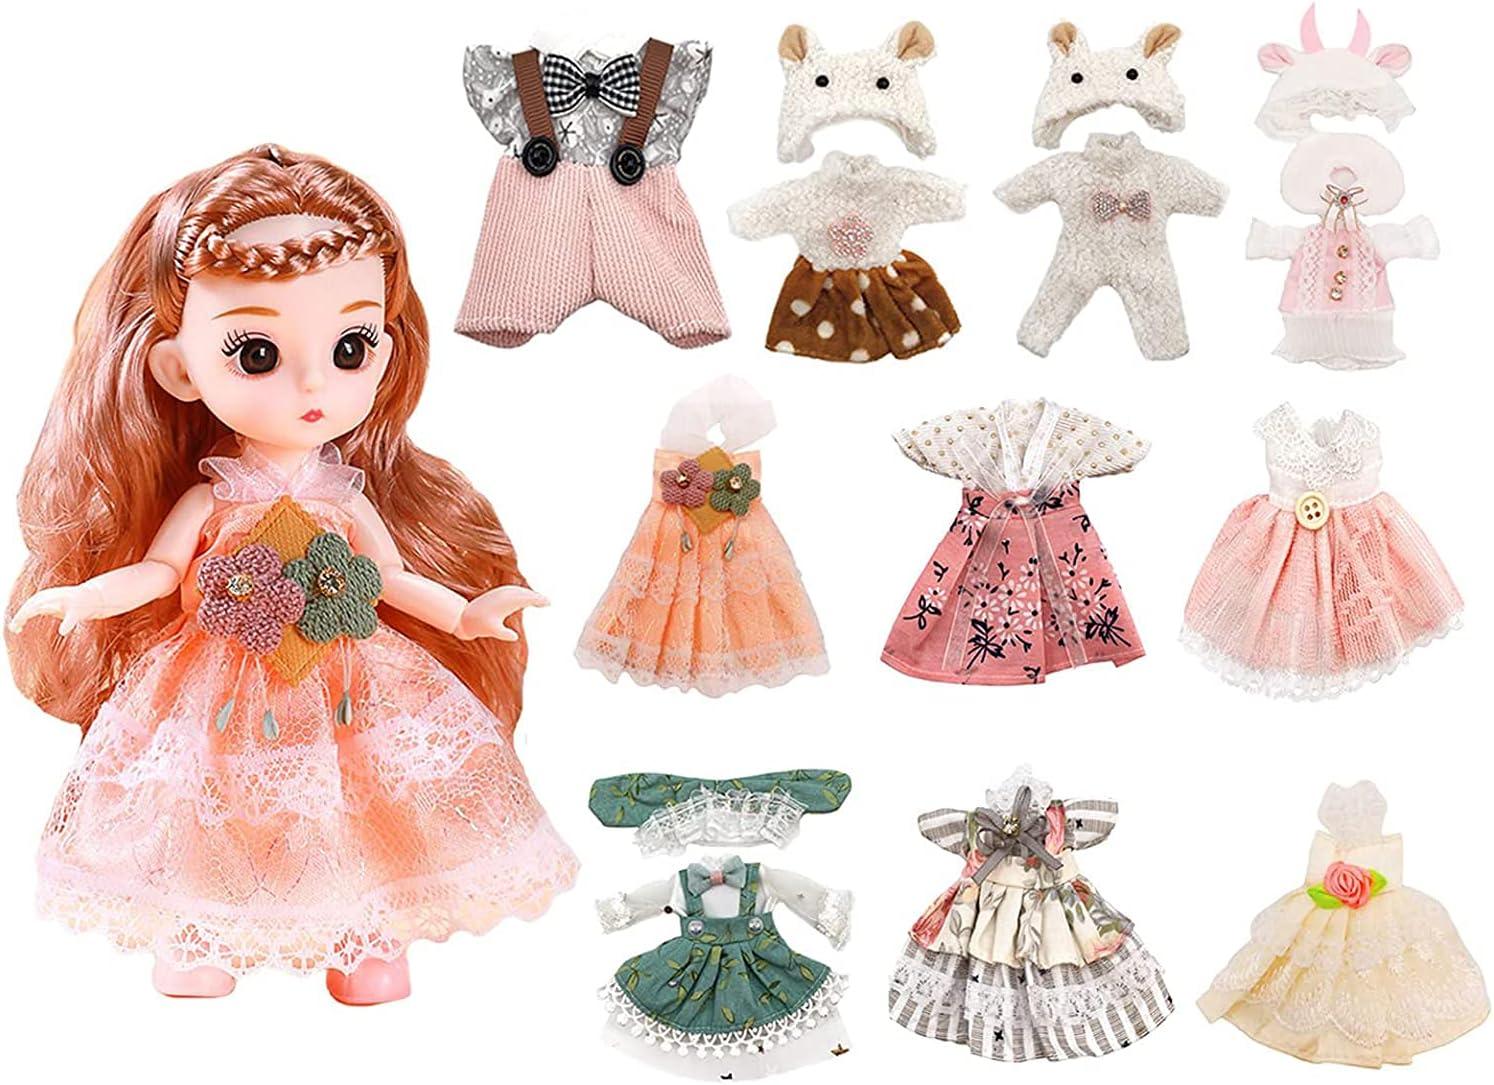 Lembani 10 unisex Sets Mini Princess Doll Dolls Price reduction 6 Clothes inch for Girl